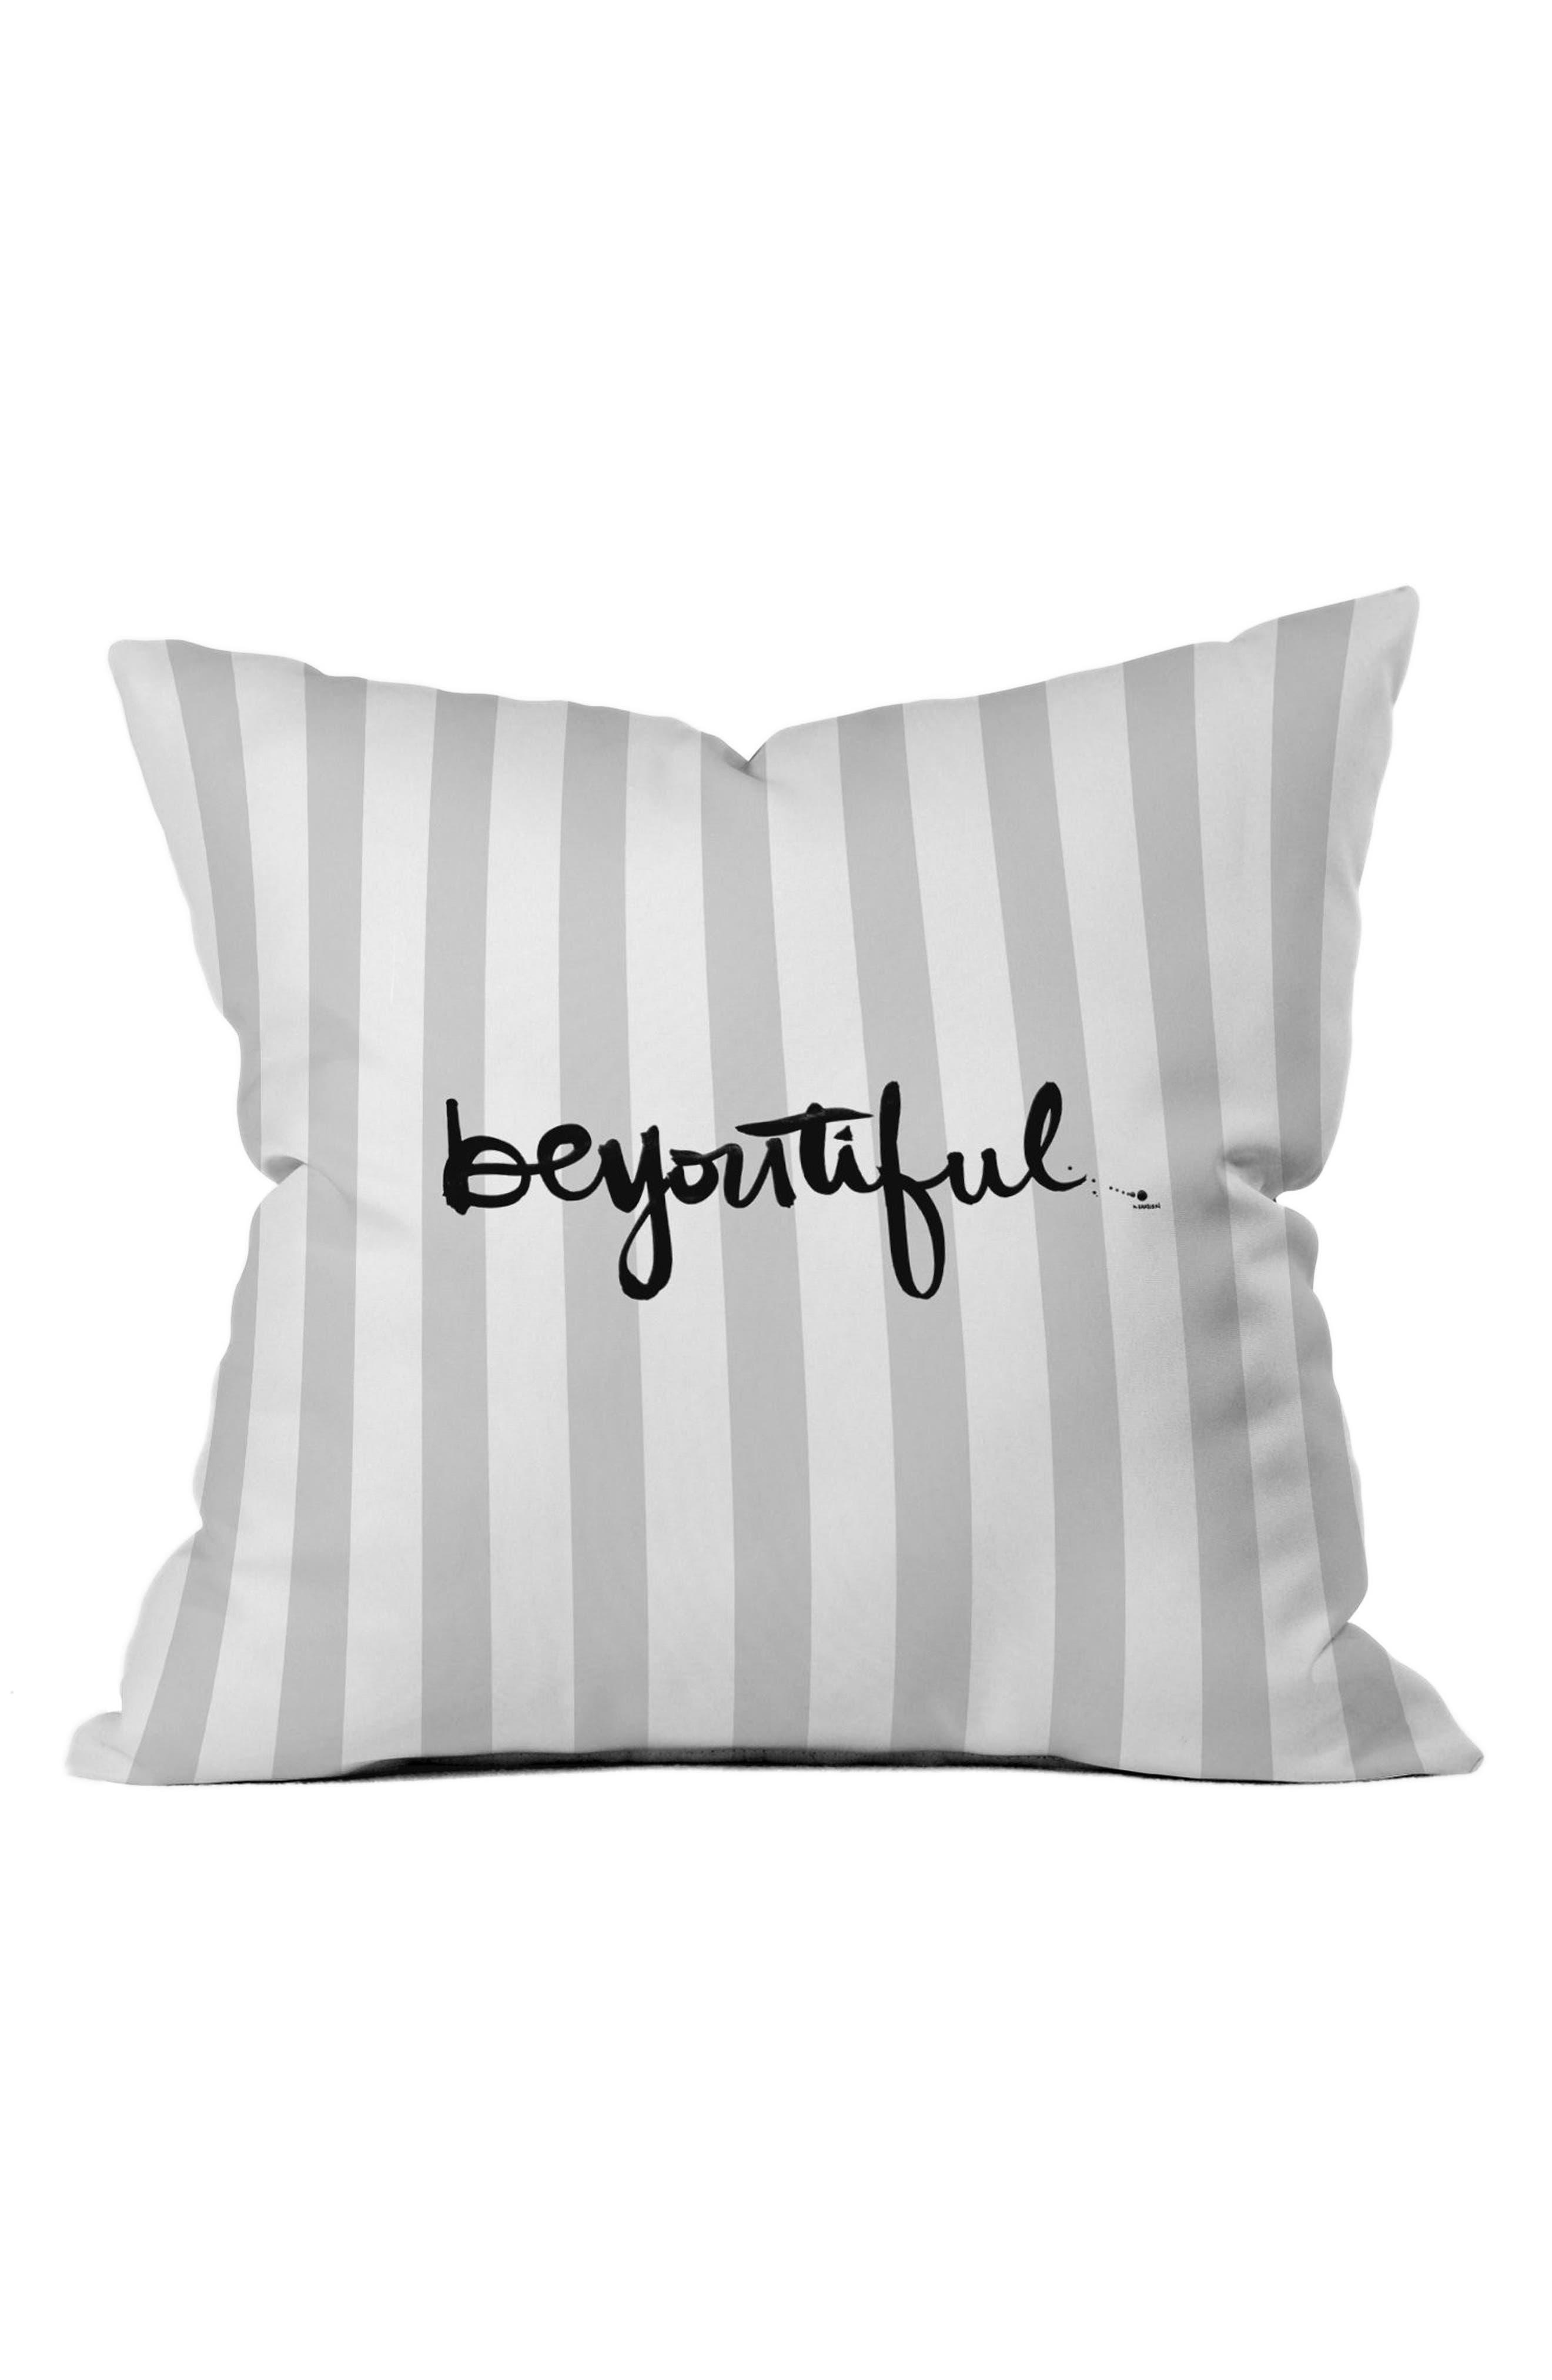 Be-you-tiful Pillow,                             Main thumbnail 1, color,